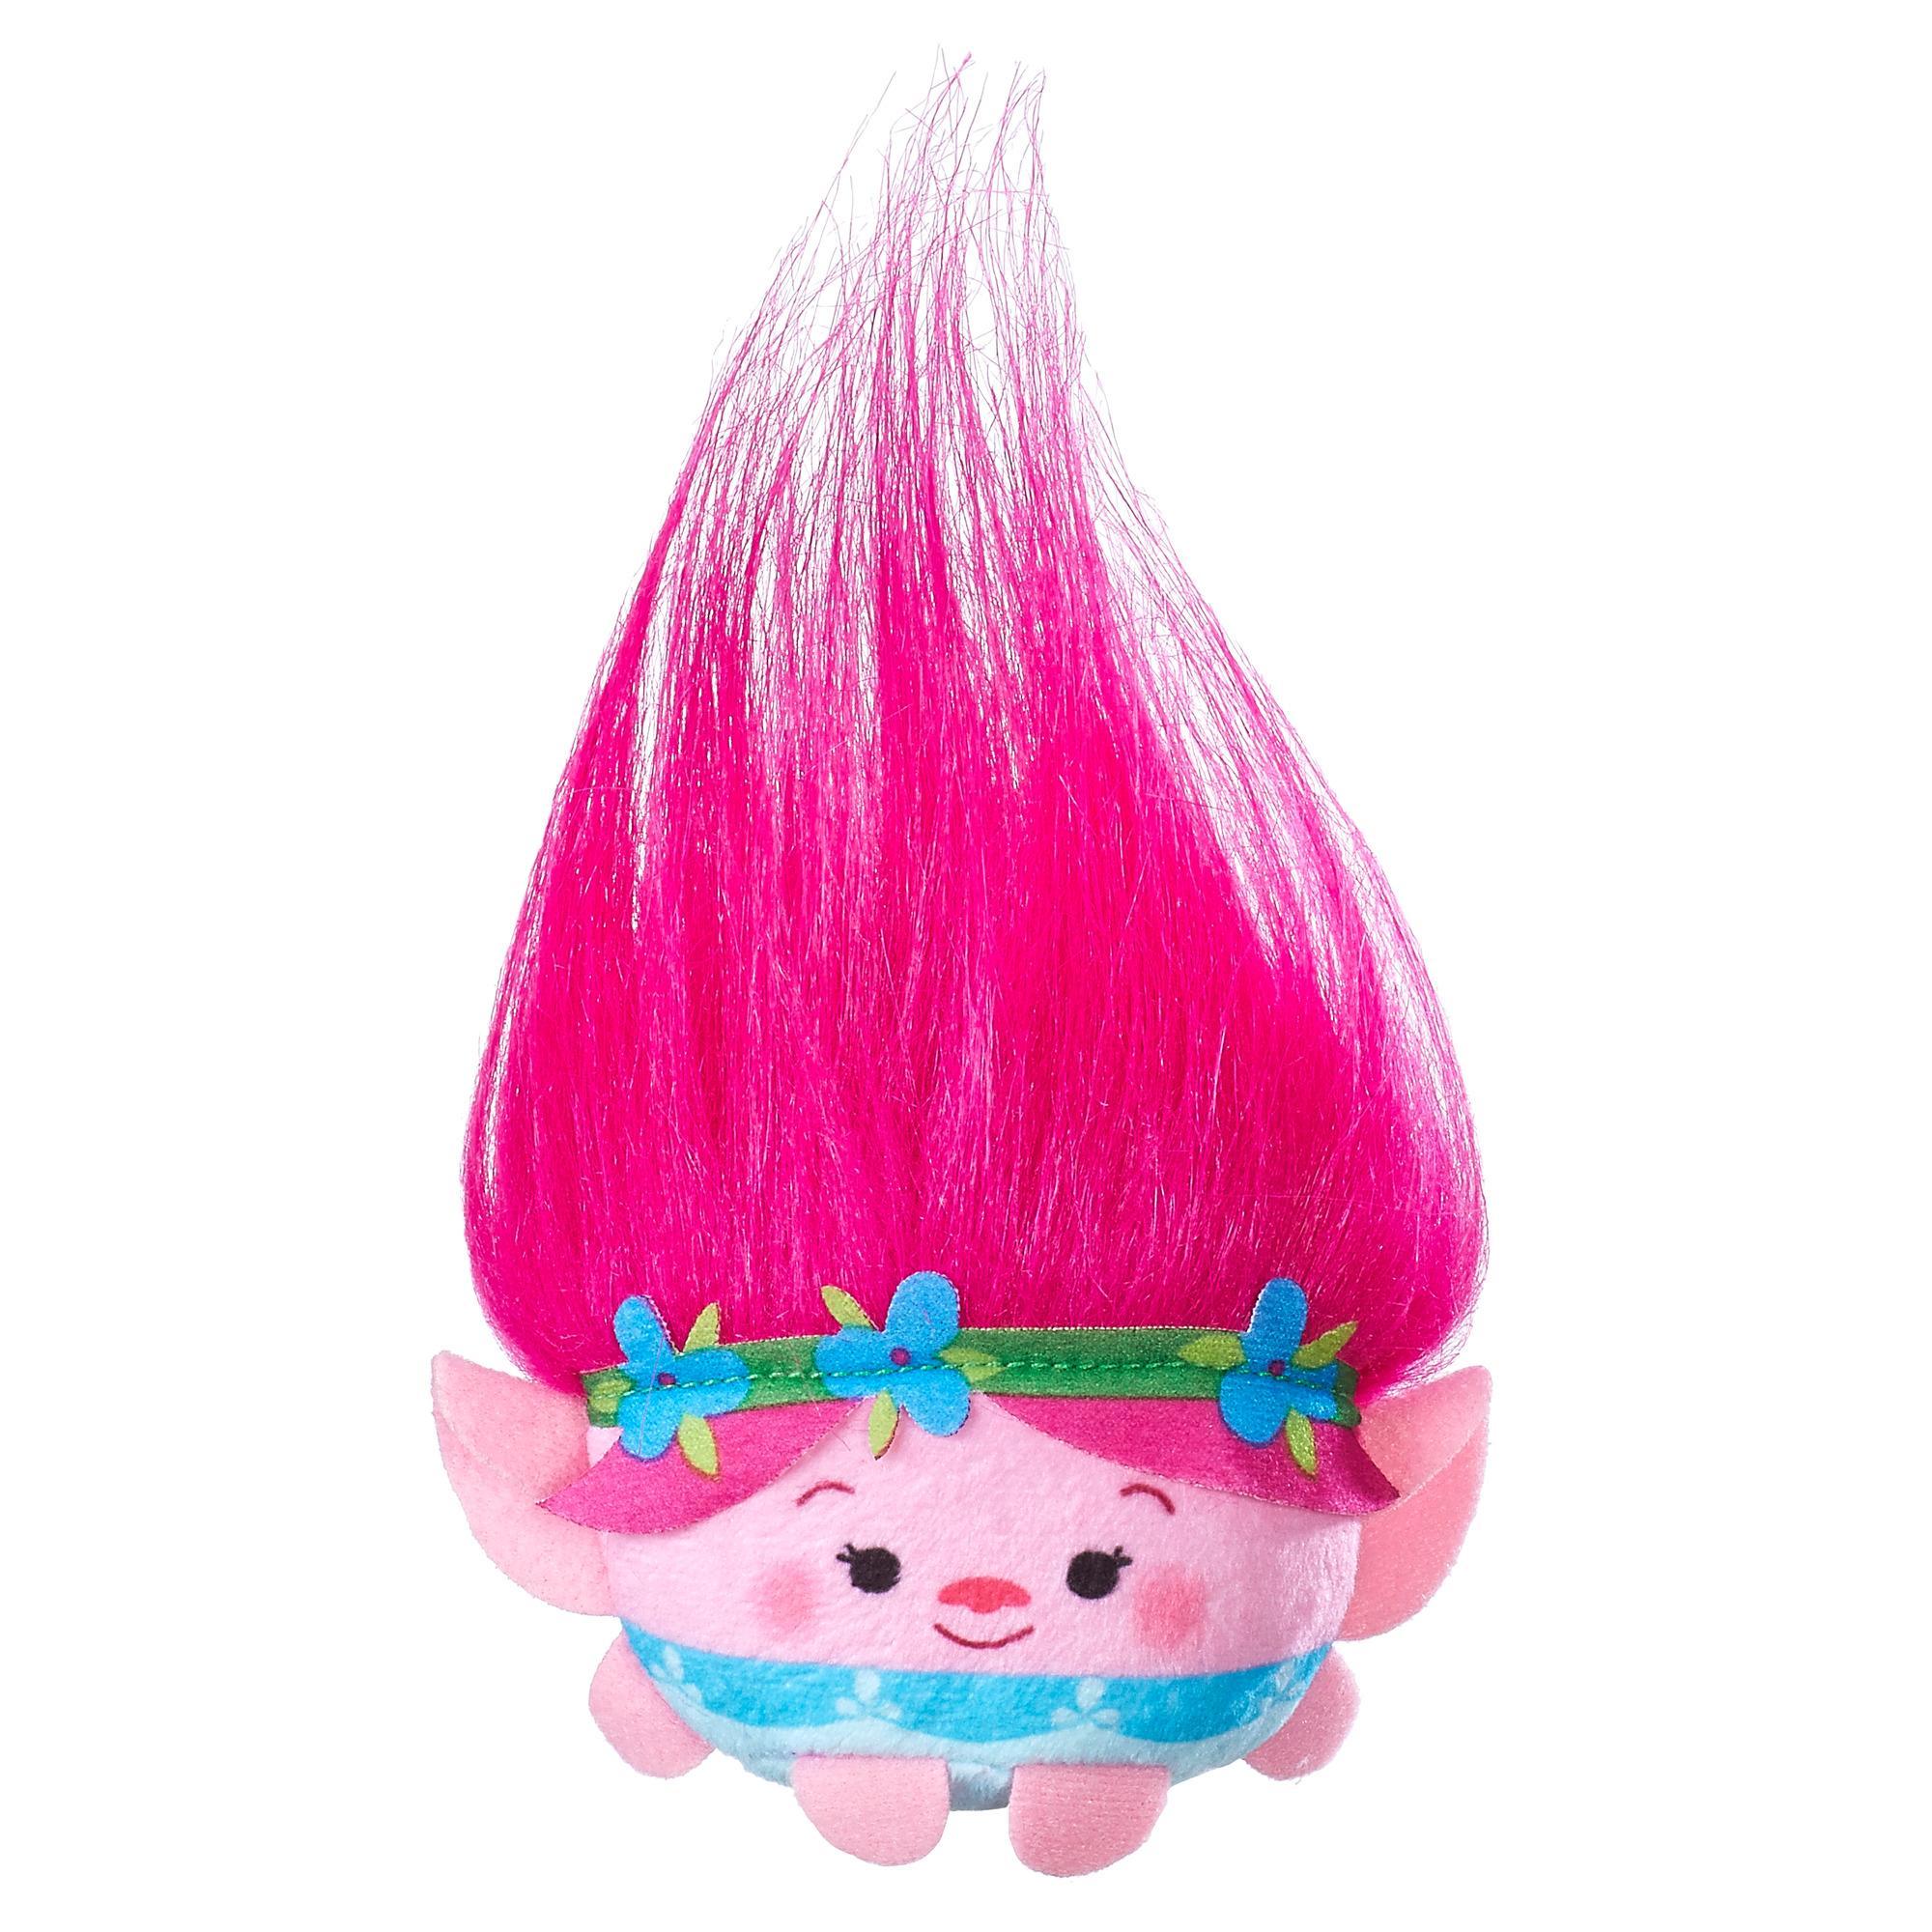 DreamWorks Trolls Poppy Mini Plush